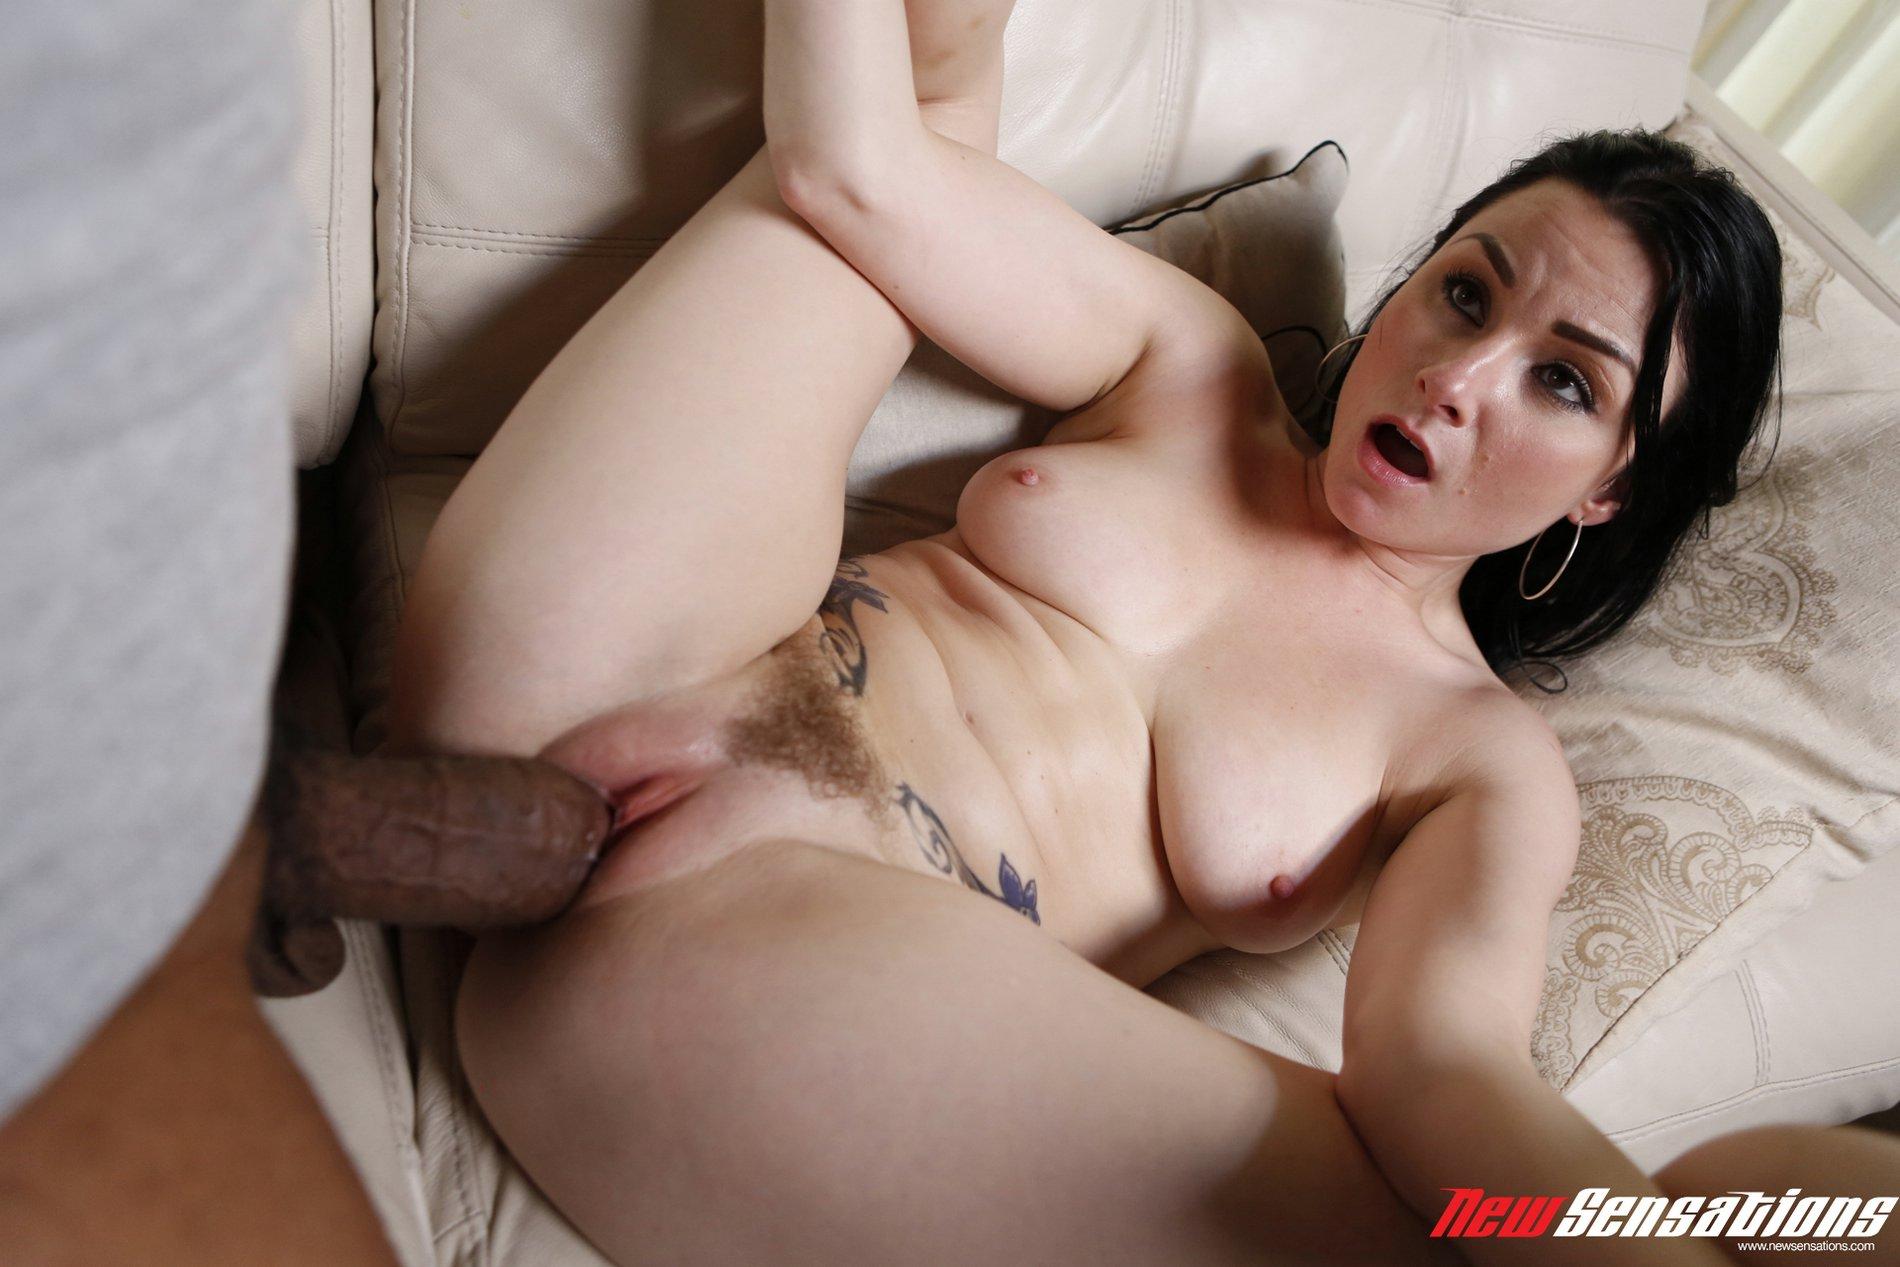 Veruca james great pov blowjob with cumshot 8